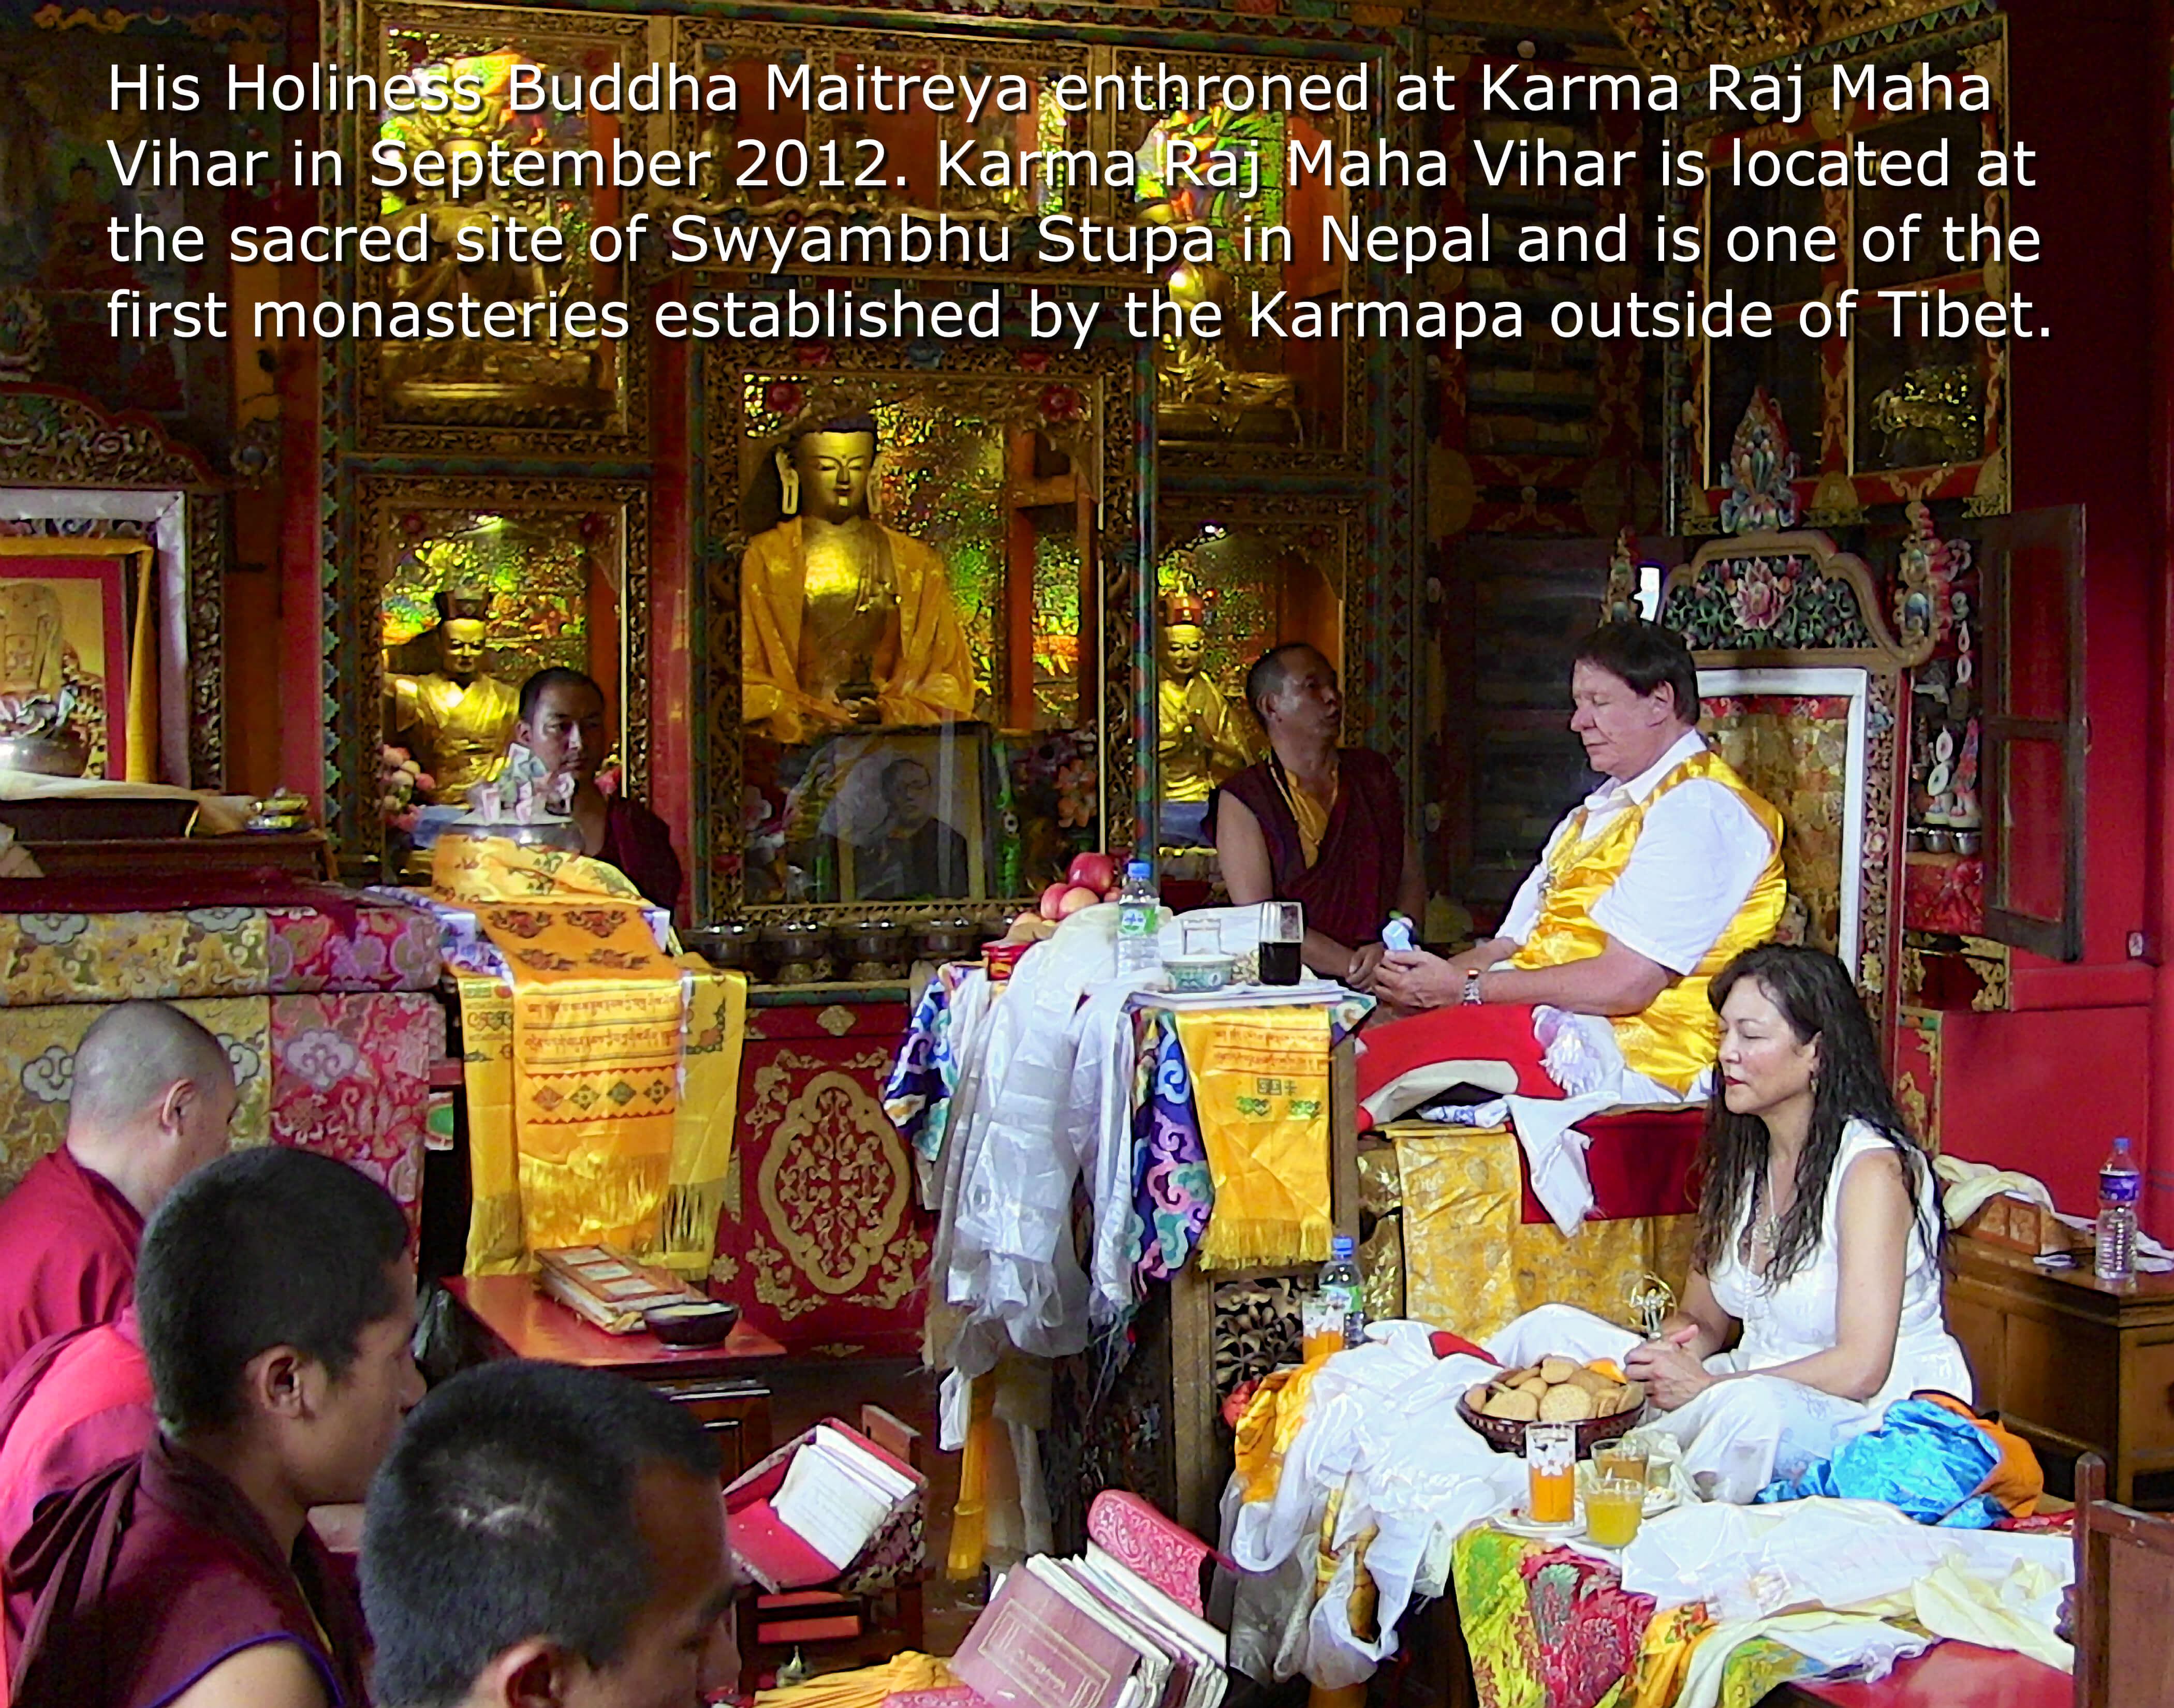 Buddha Maitreya Enthroned at Karma Raj